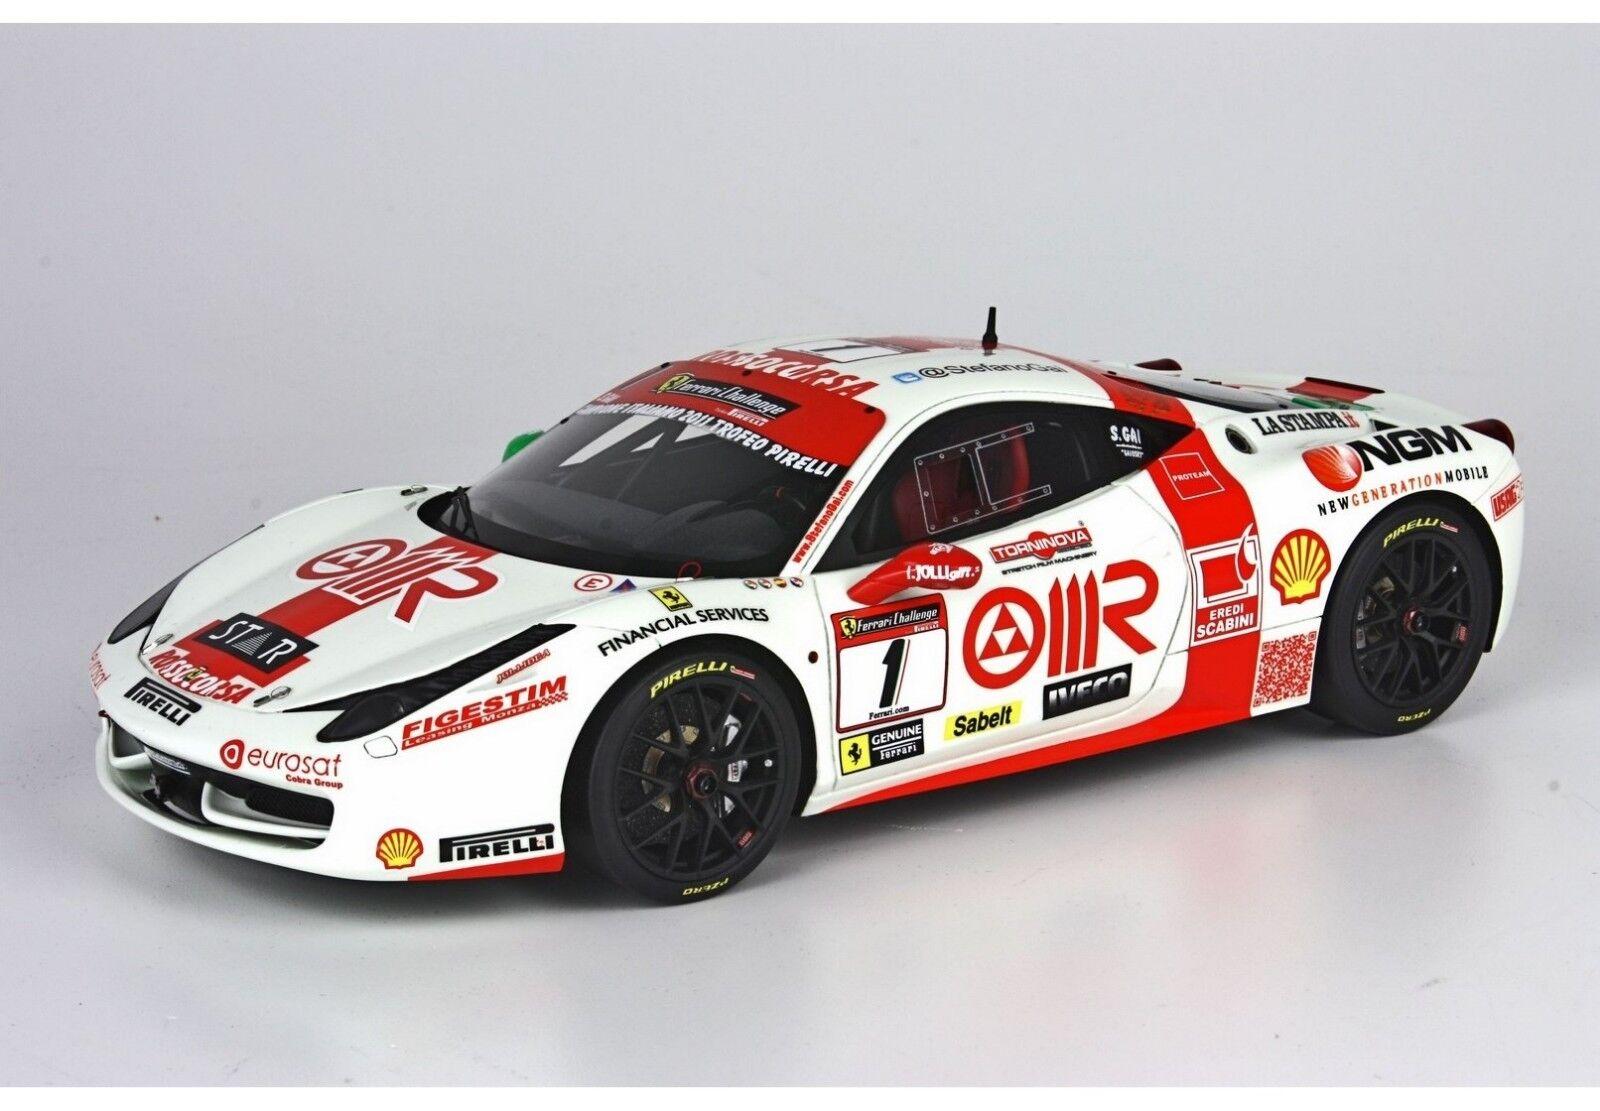 clásico atemporal 1 18 Ferrari 458 Gai Monza 2011 2011 2011 1 18 • BBR P1833B  buena calidad